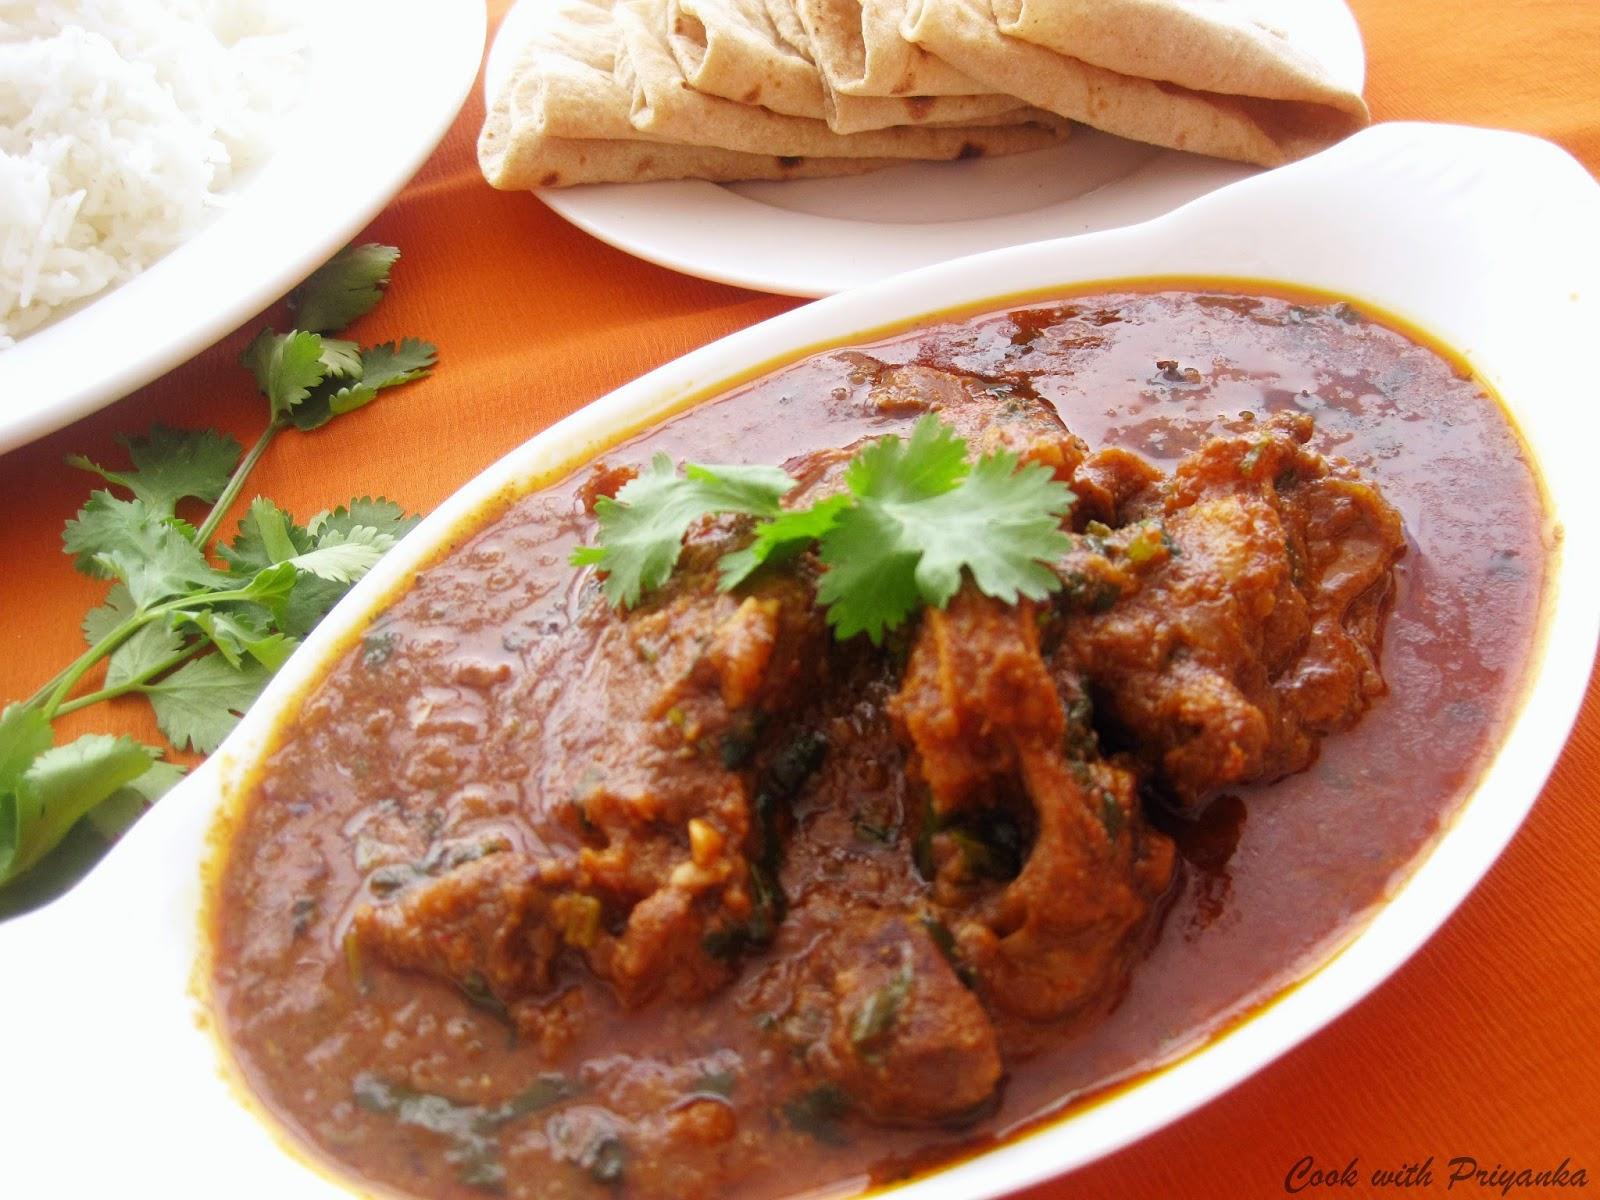 http://cookwithpriyankavarma.blogspot.co.uk/2014/04/rajasthani-laal-maas.html